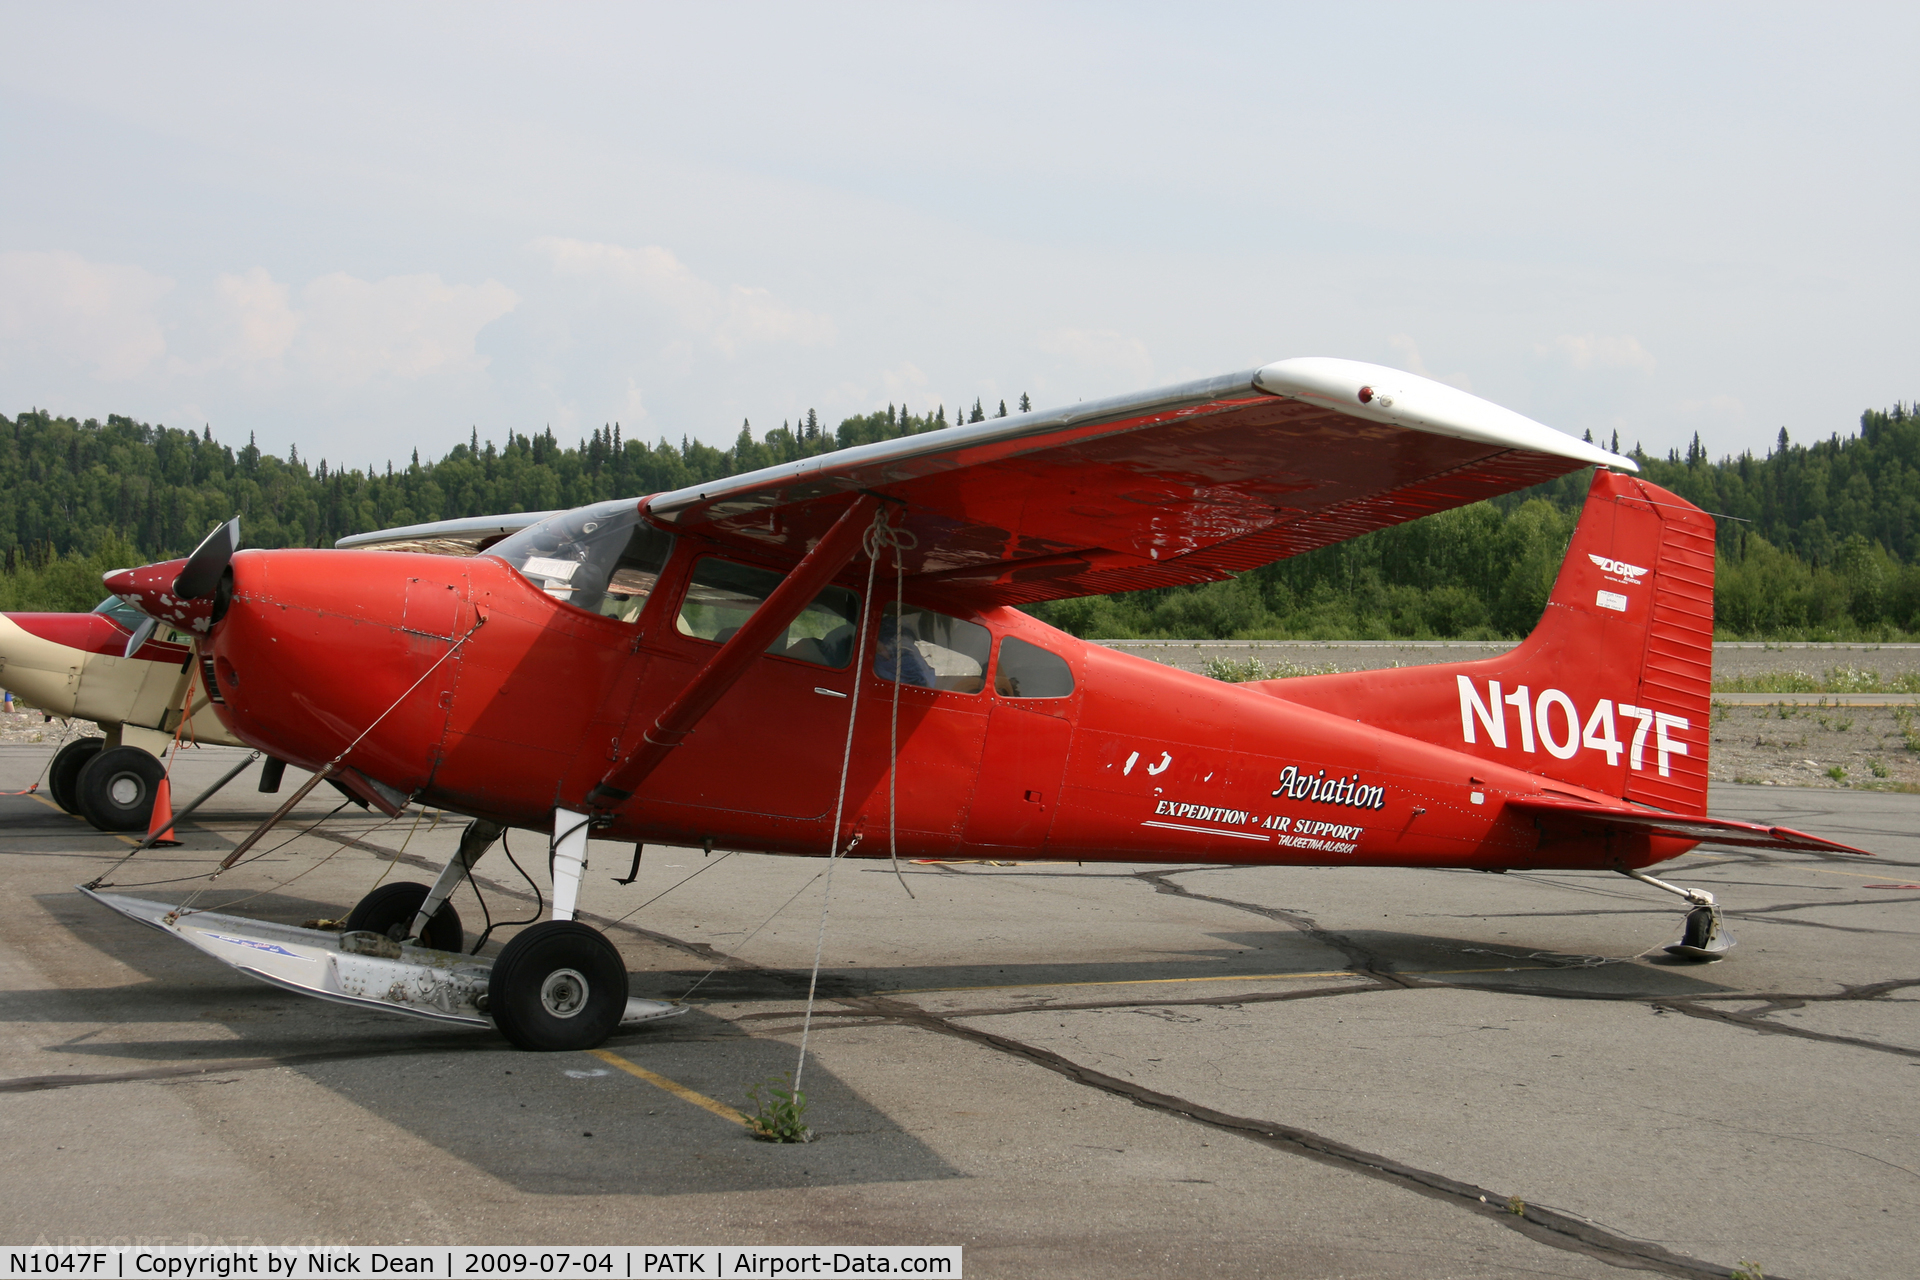 N1047F, 1975 Cessna A185F Skywagon 185 C/N 18502704, PATK